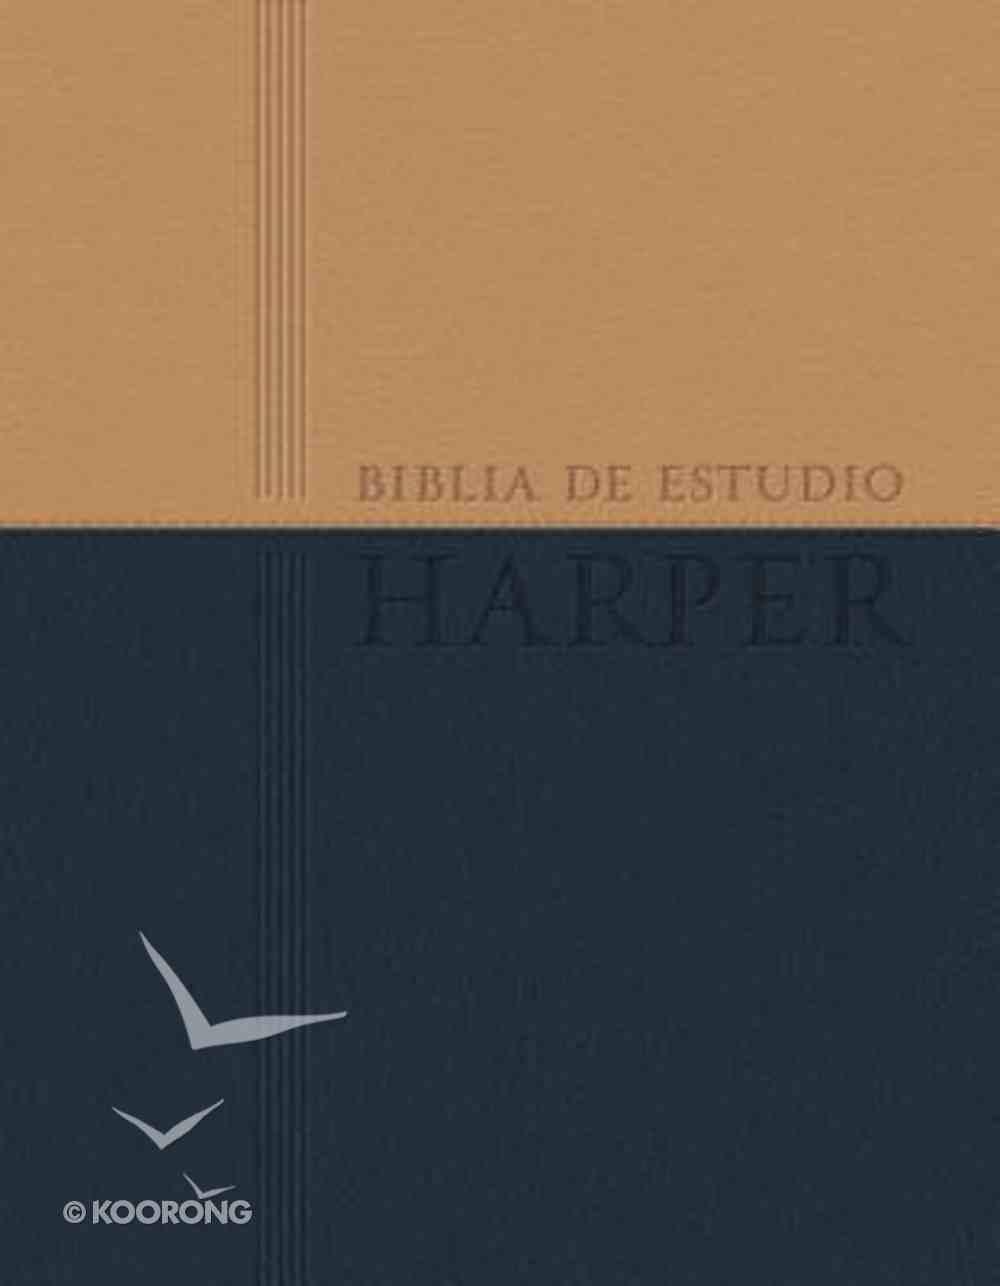 Rvr 1960 Biblia De Estudio Harper Con Indice Navy (Red Letter Edition) (Harper Study Bible) Premium Imitation Leather